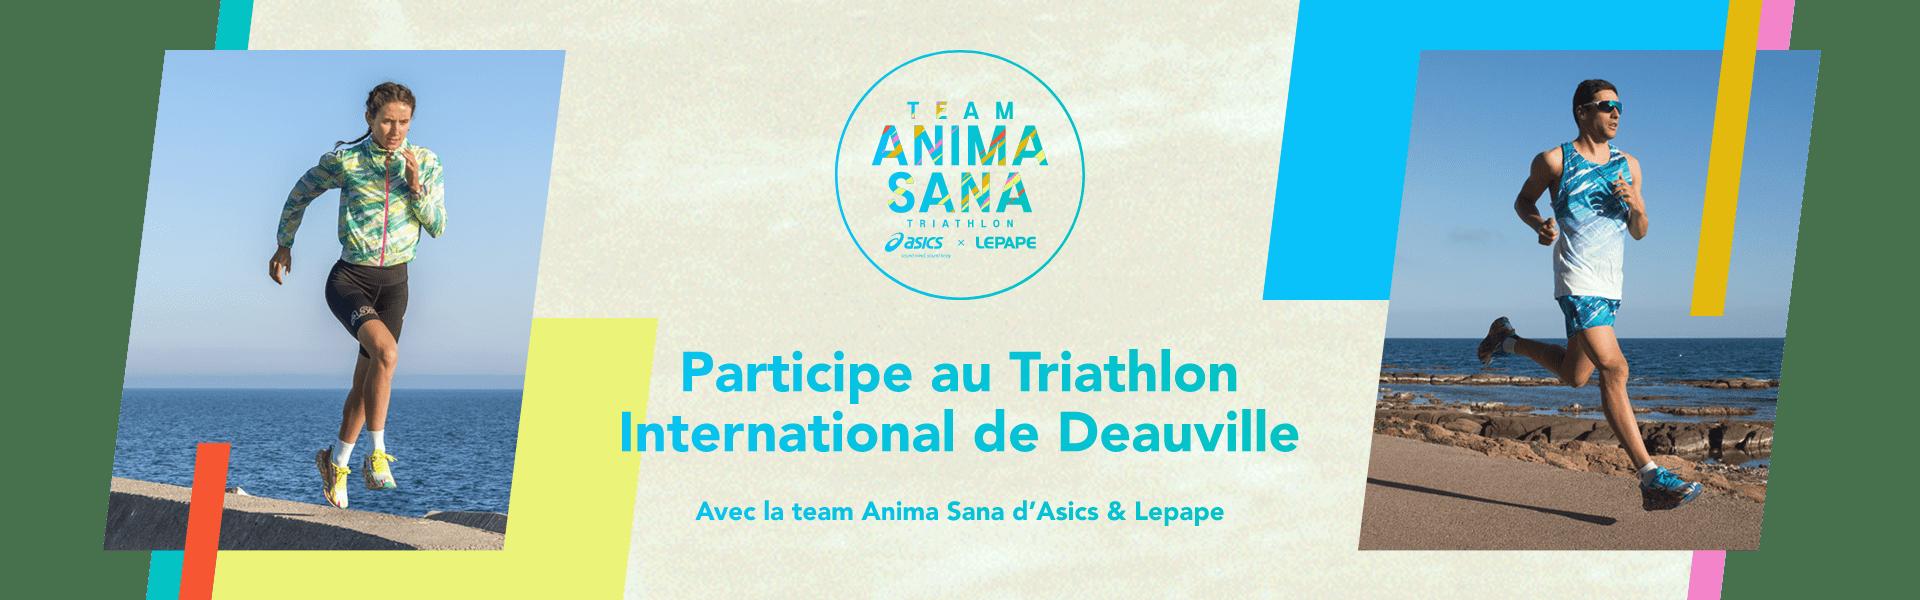 Participe au Triathlon International de Deauville